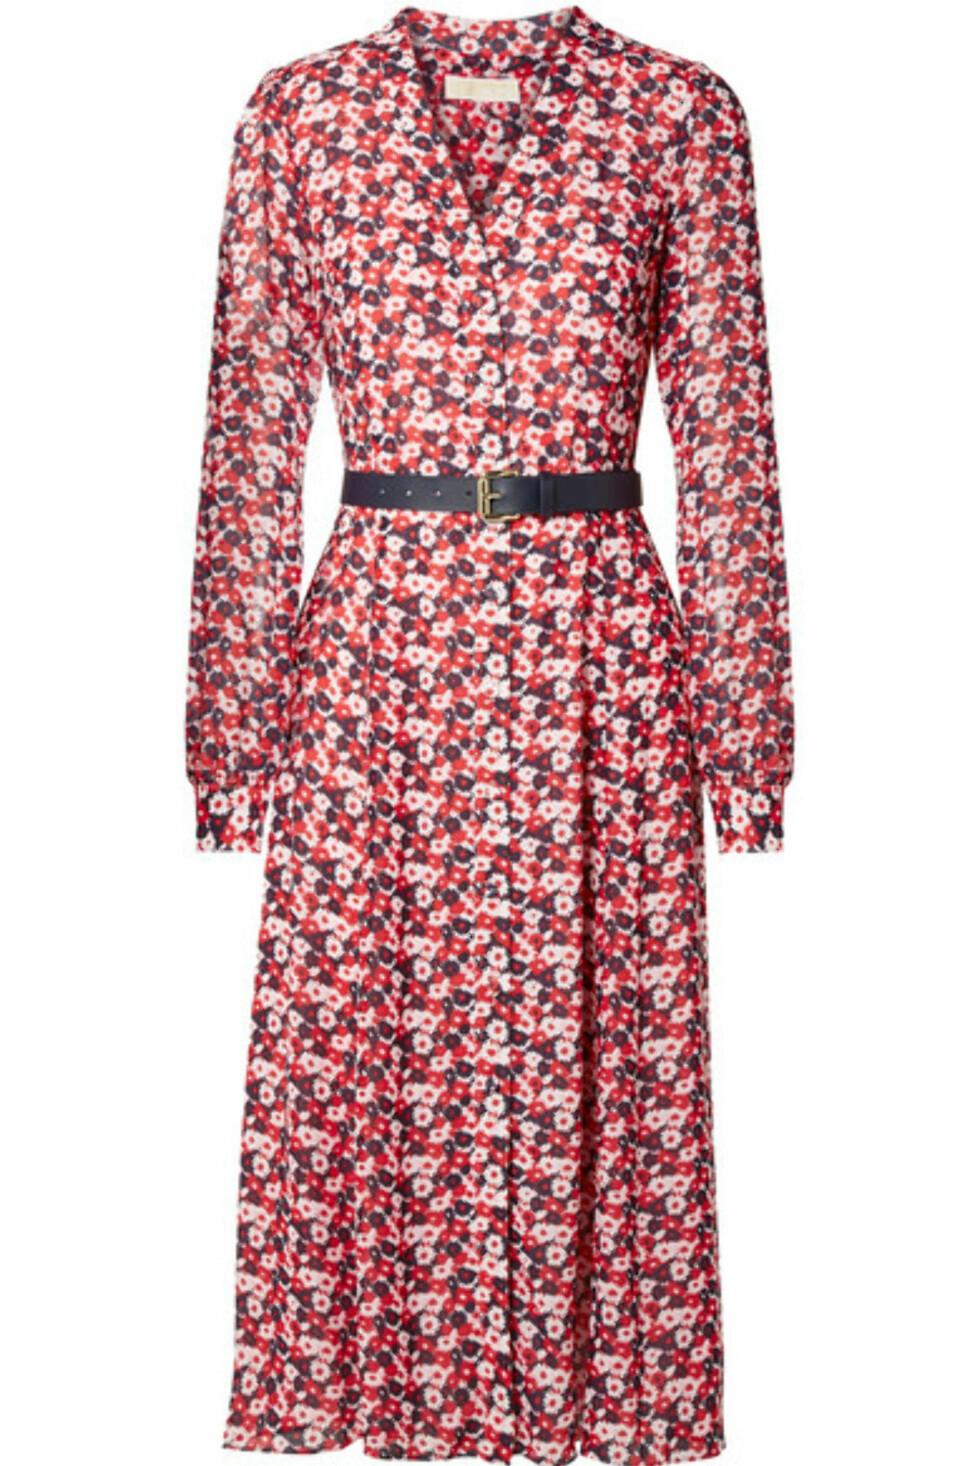 Kjole fra Michael Kors |2200,-| https://www.net-a-porter.com/no/en/product/1016264/michael_michael_kors/belted-floral-print-crepe-midi-dress